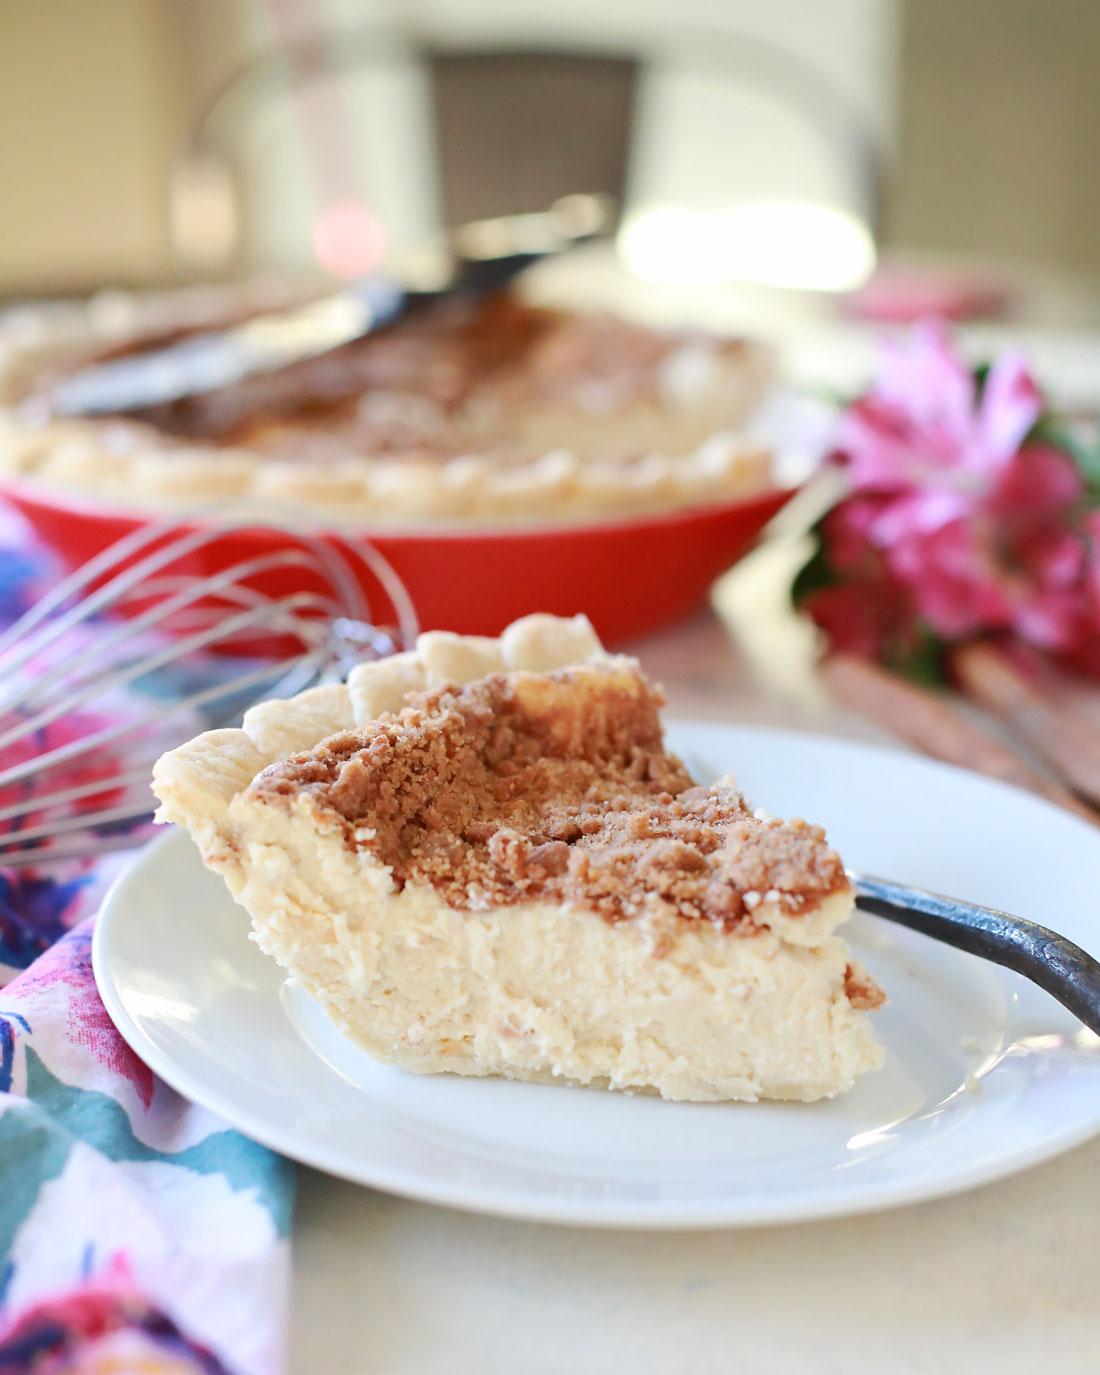 Incredibly delicious sopapillas cheesecake pie! It's soooo good!